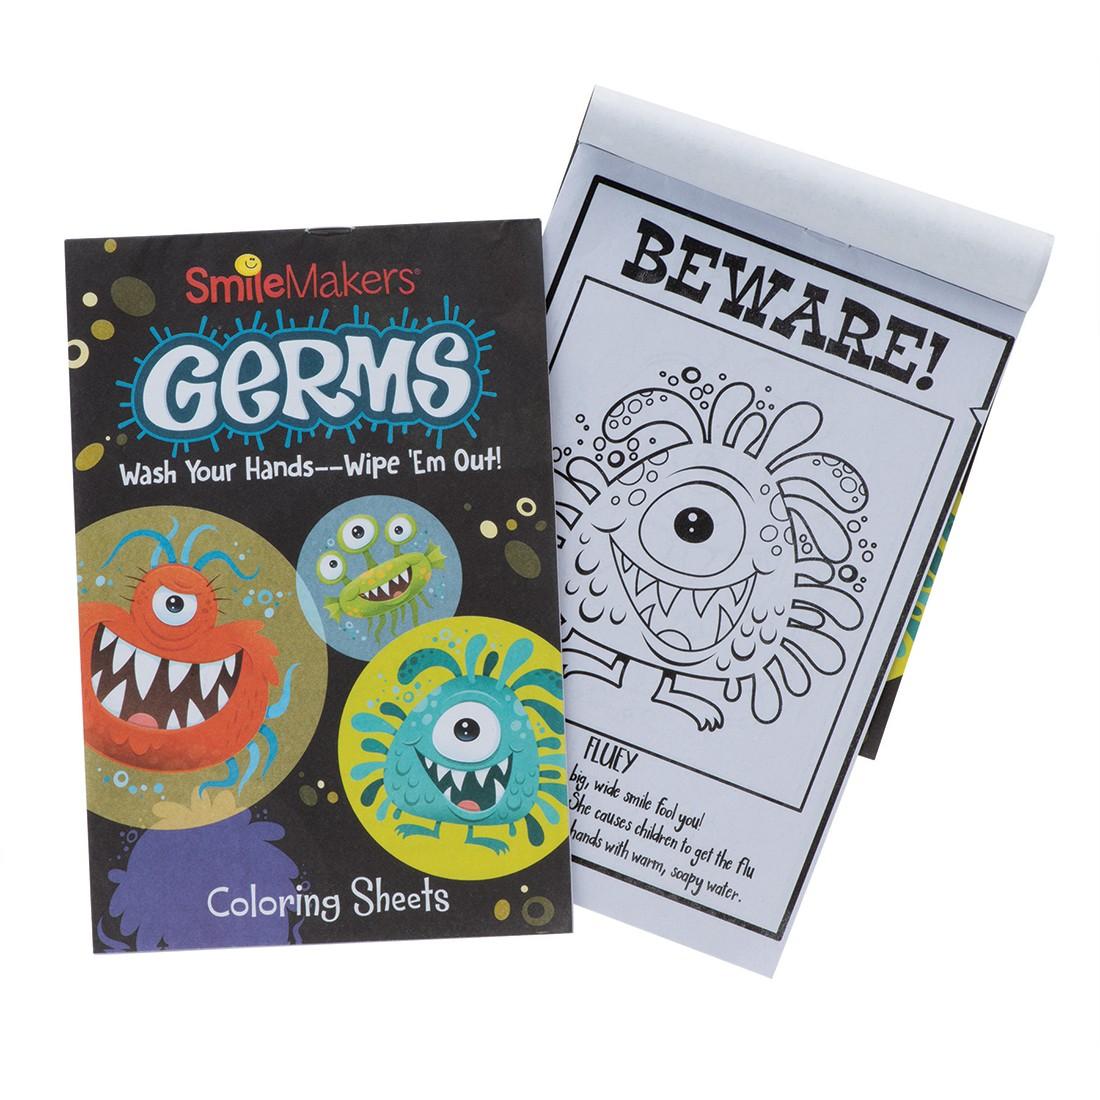 Germ Squad Coloring Books [image]